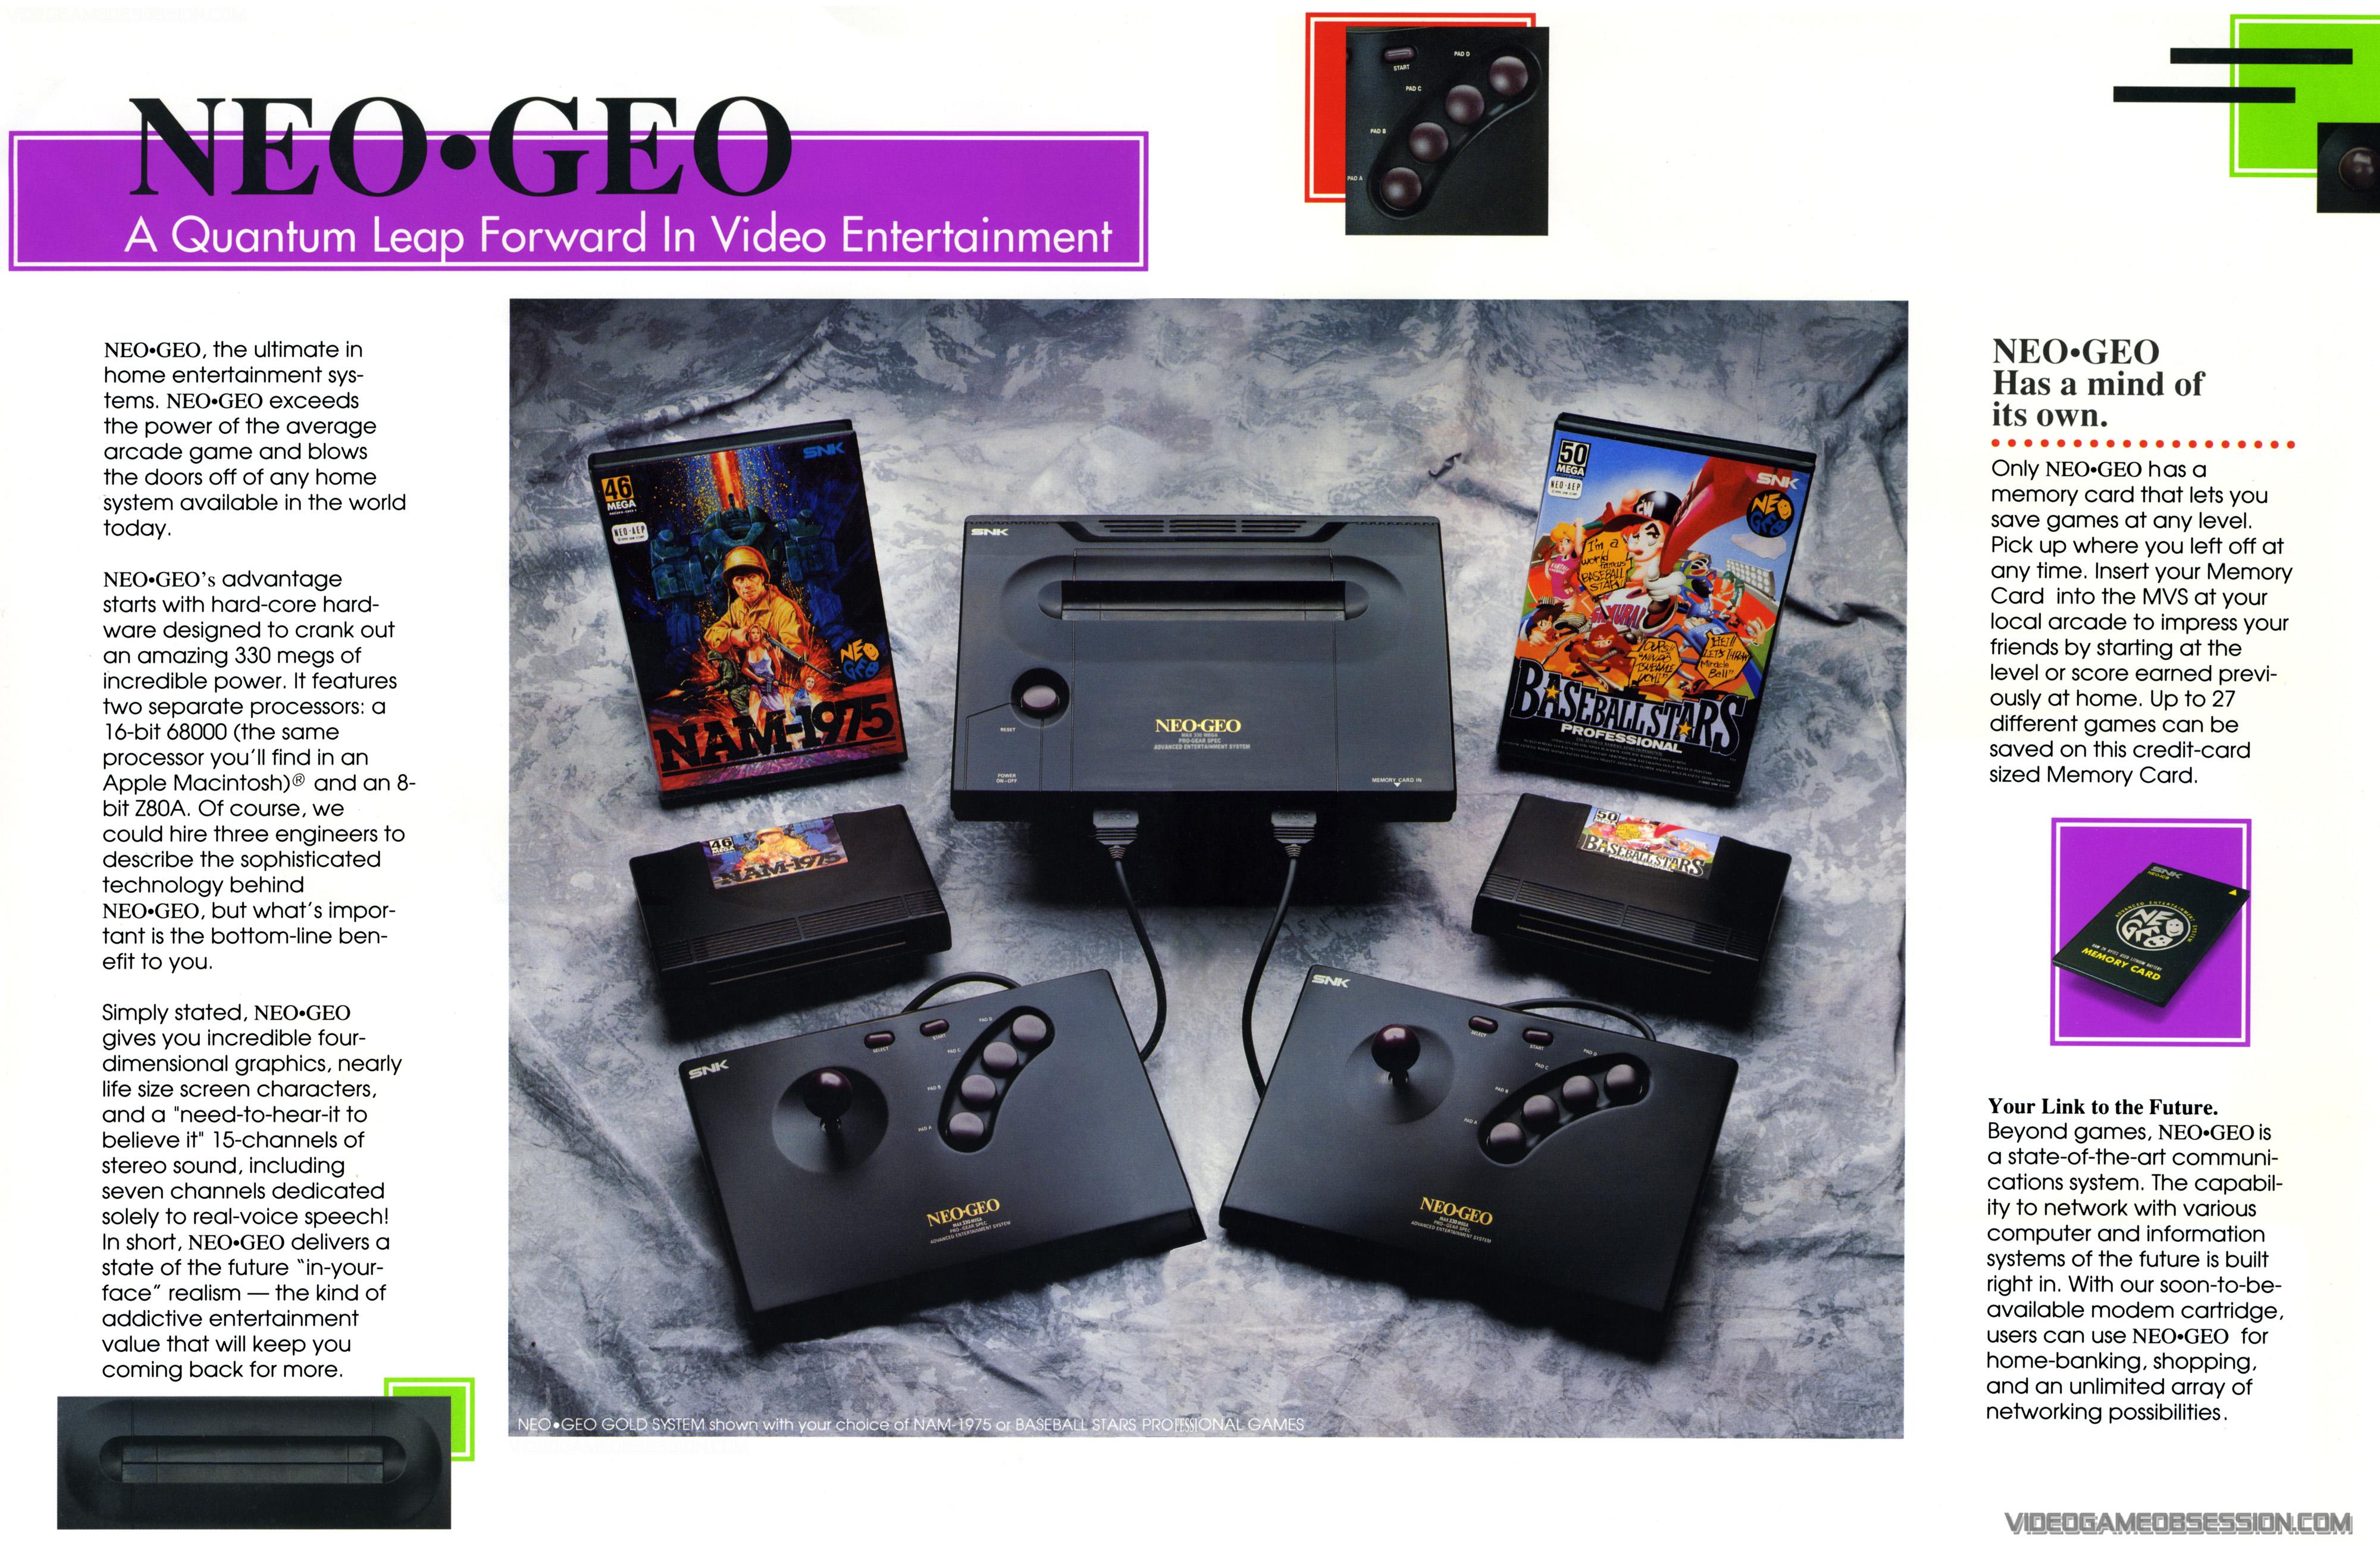 www.videogameobsession.com/neogeo/neo-scans/Neo-Geo_Quantum_Leap_1990-02-vgo.jpg